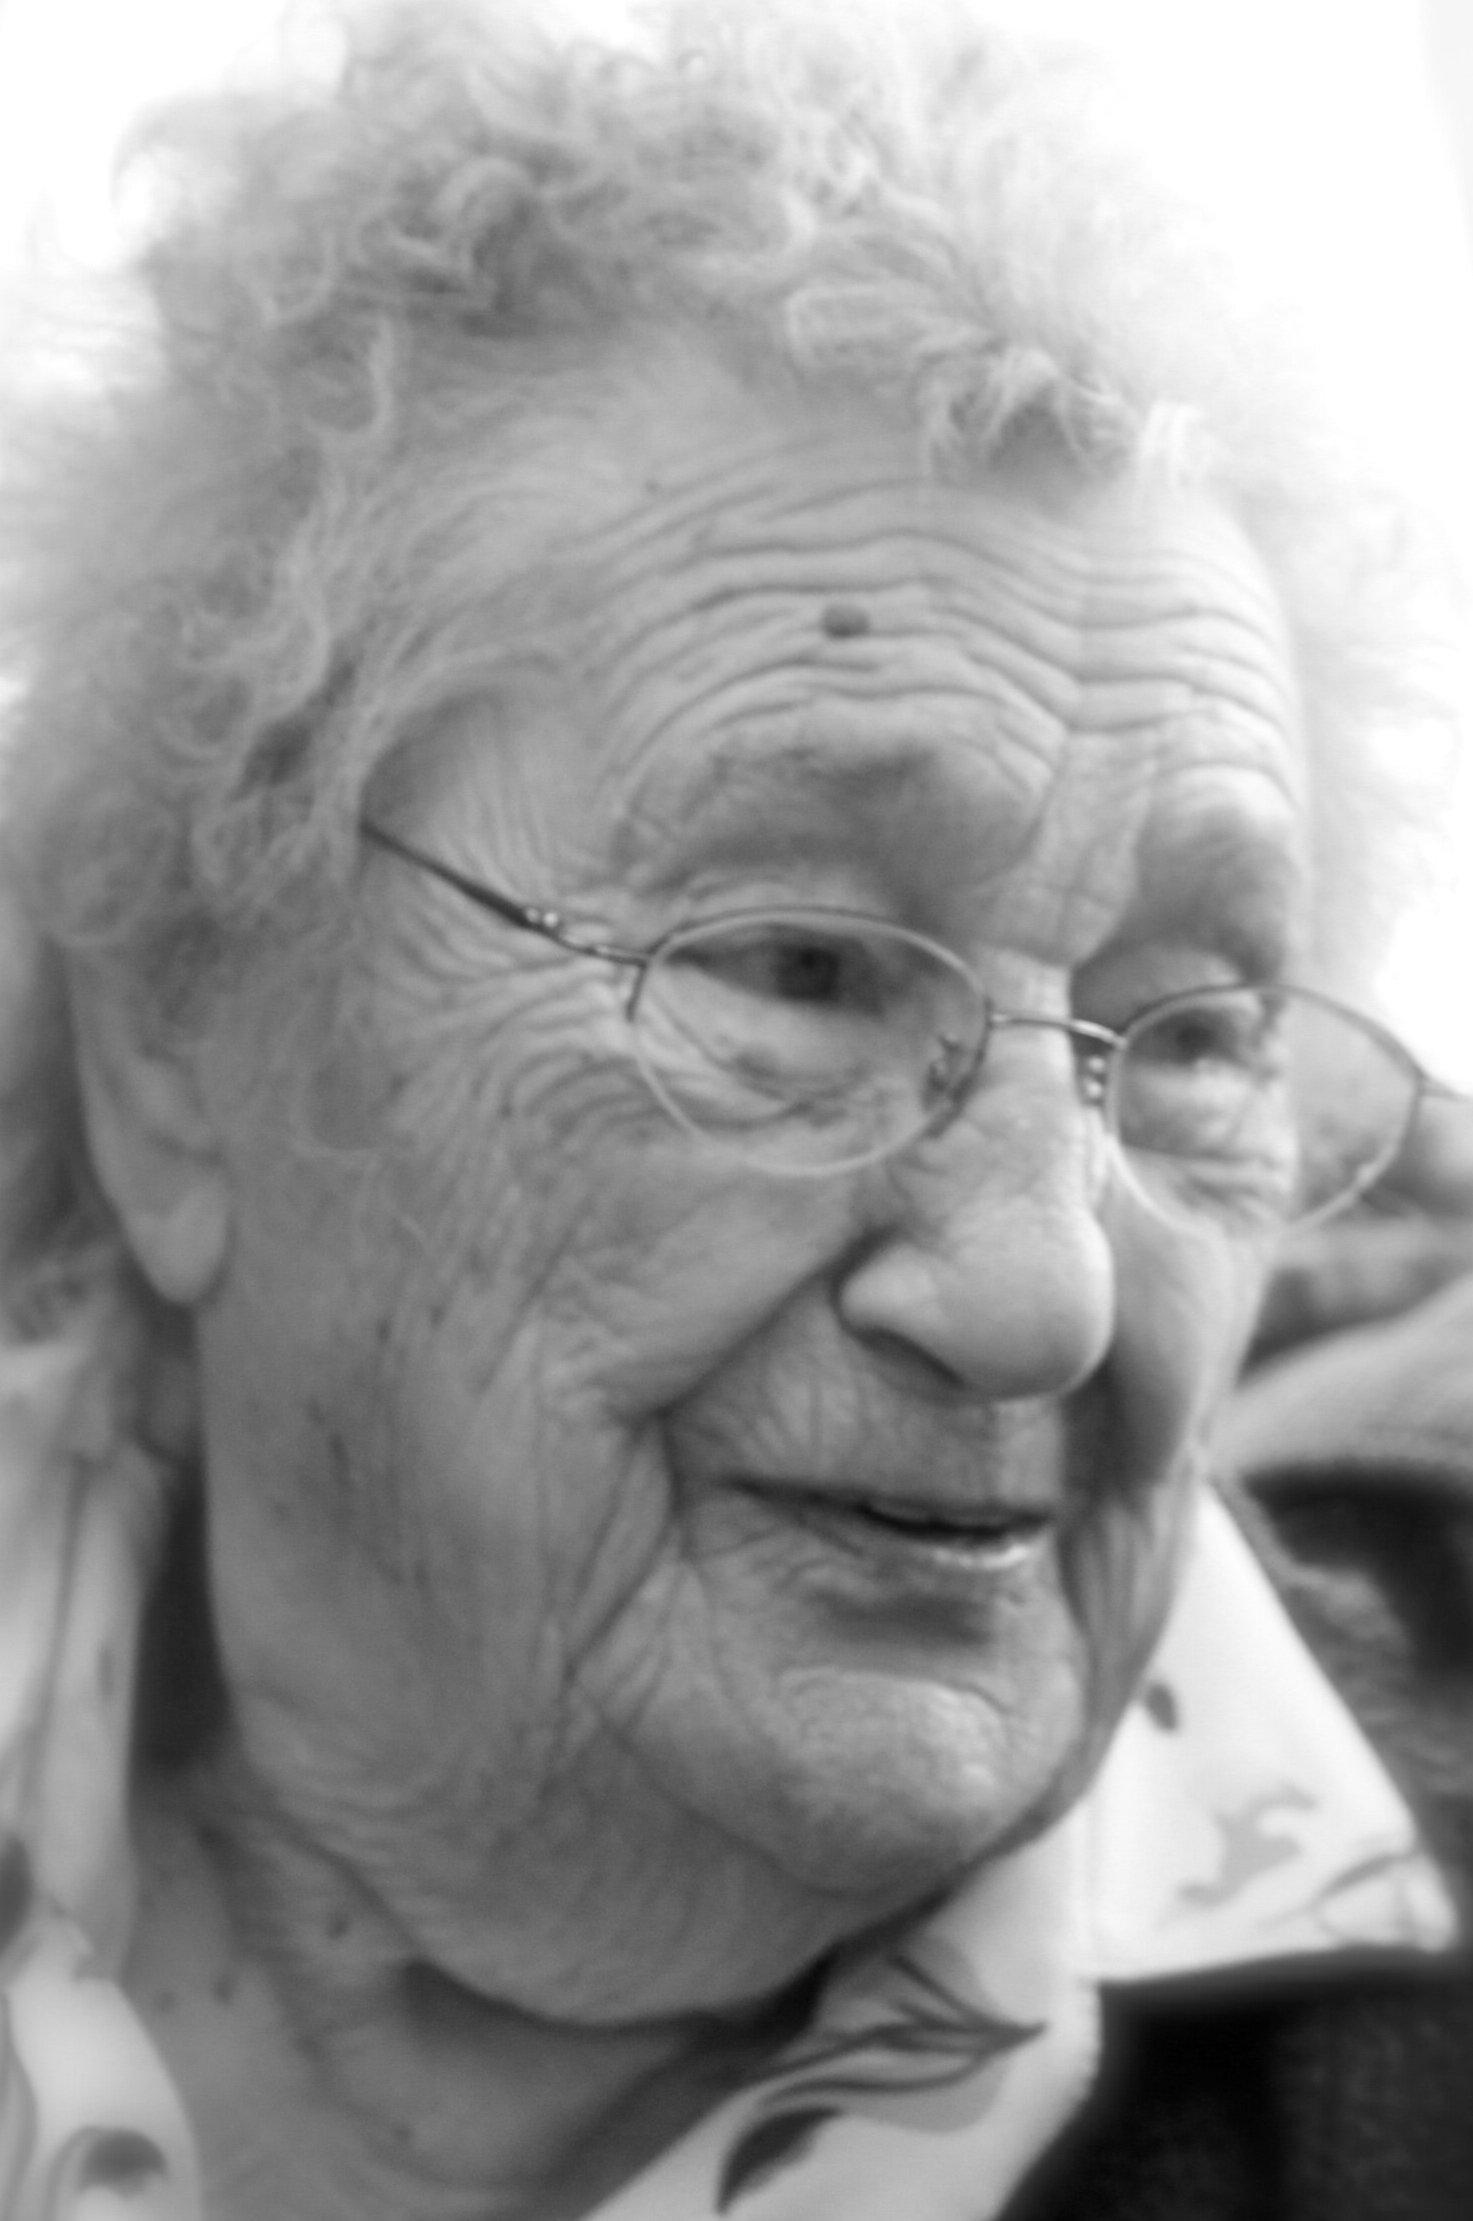 Mary Elizabeth Richert (photo by Scott P. Richert)